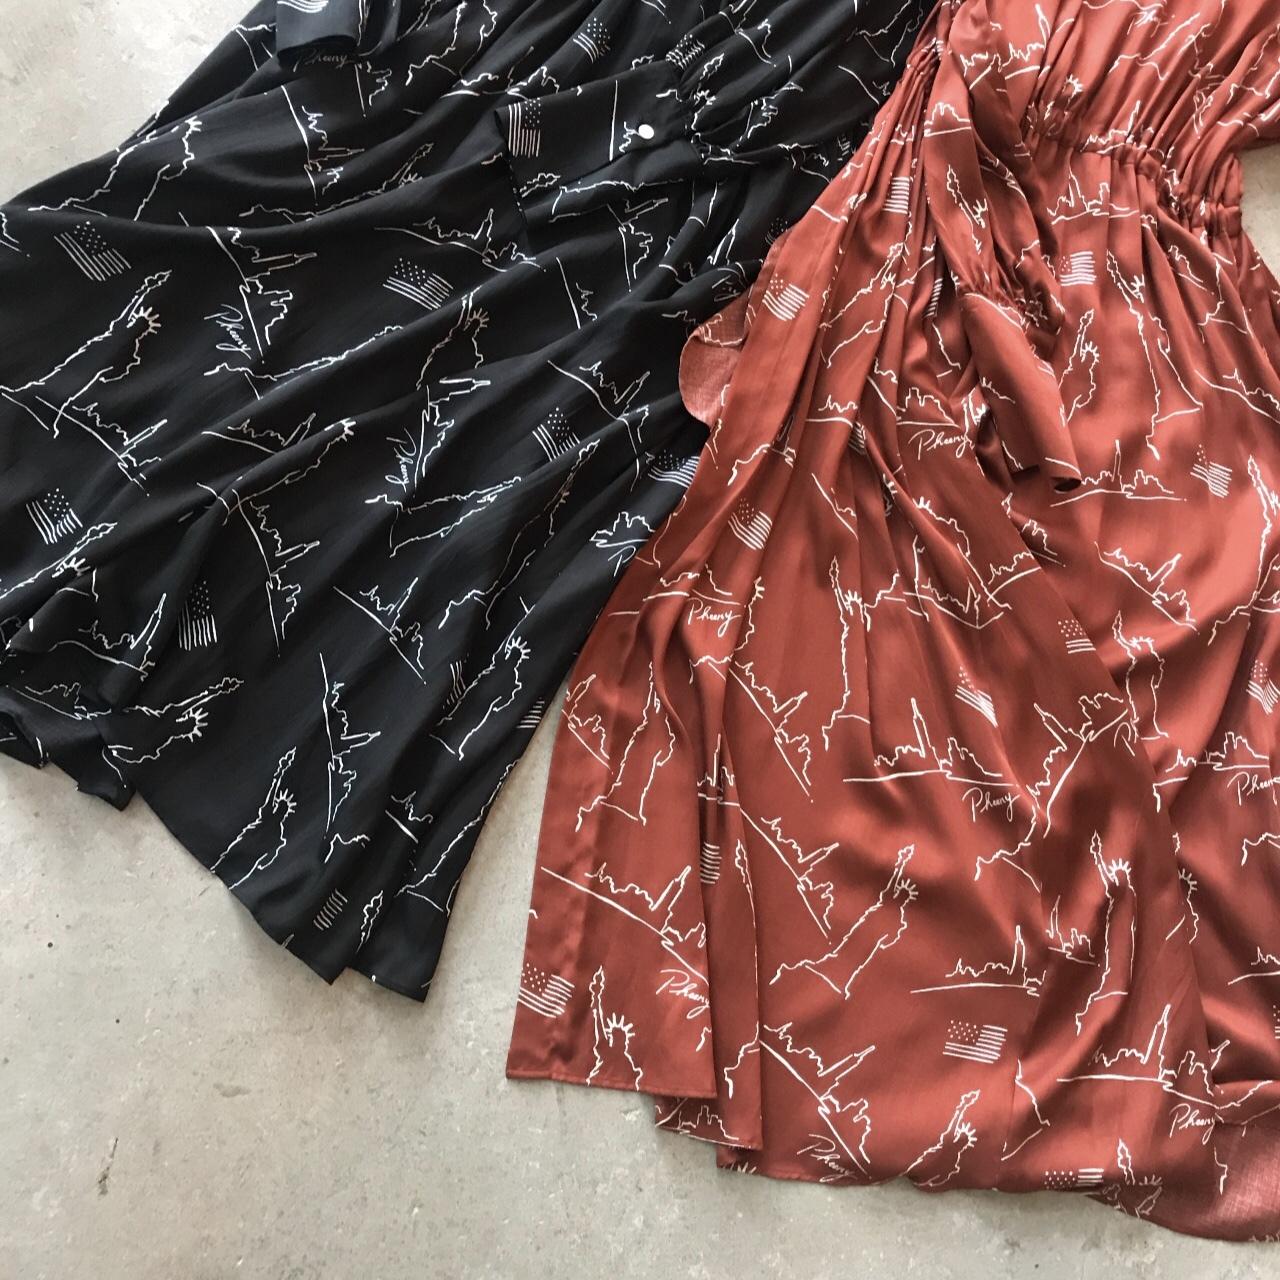 PHEENY - NYC printed back open dress